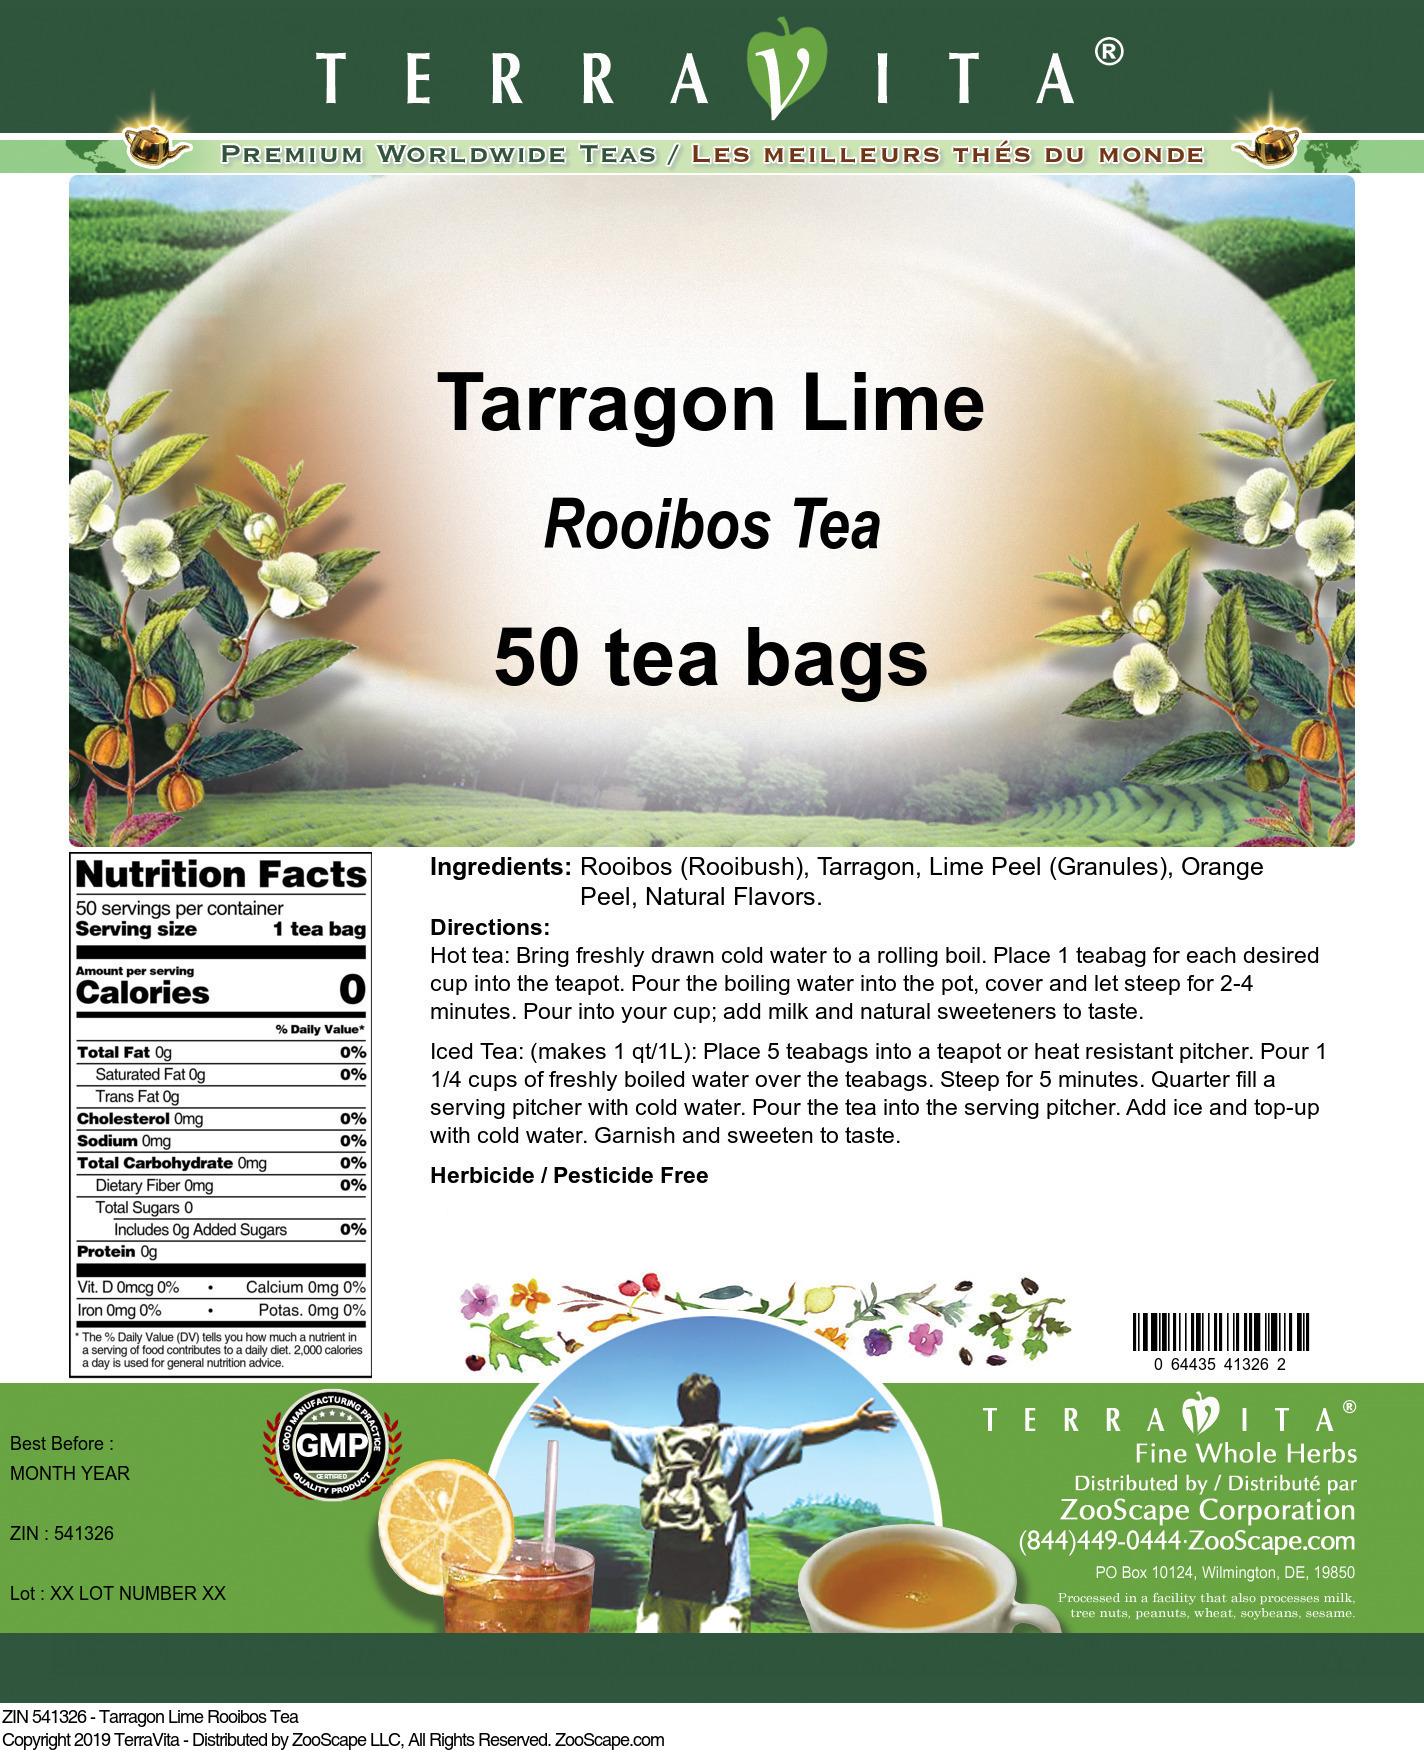 Tarragon Lime Rooibos Tea